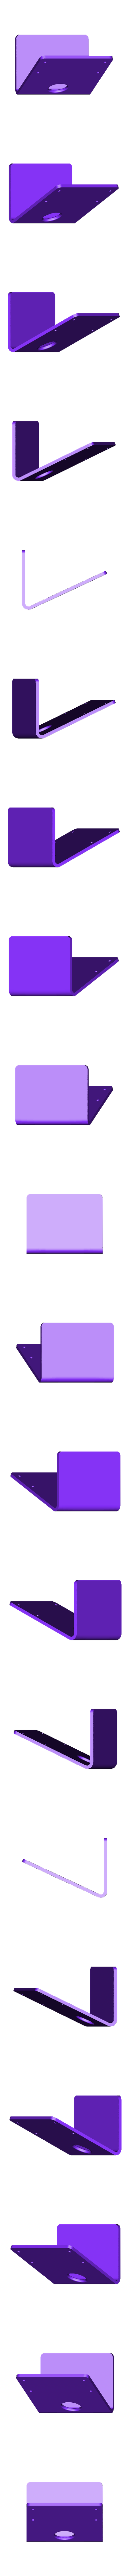 Pi_Zero_Stand.stl Download free STL file Raspberry Pi Zero Stand • 3D printing object, Adafruit